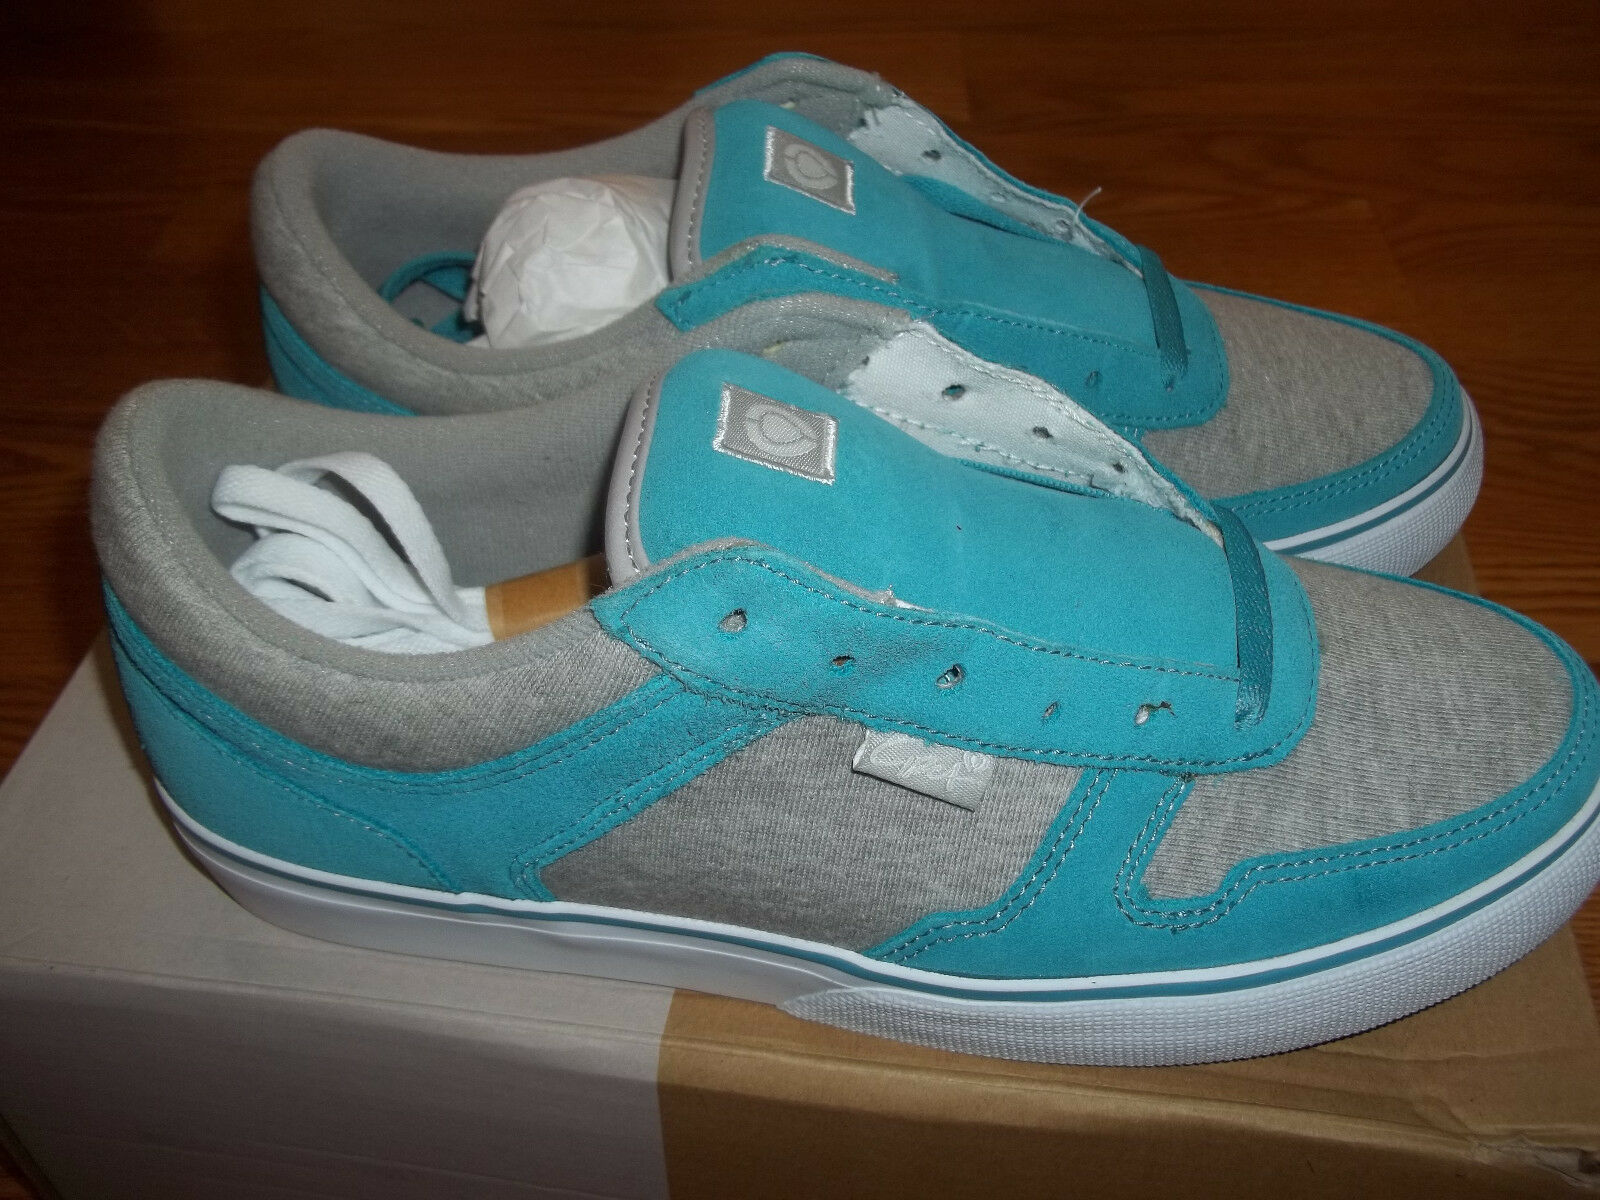 Circa 4 Track Blue/Gray Brand Womens Shoes Size 10 Brand Blue/Gray New f71d2b